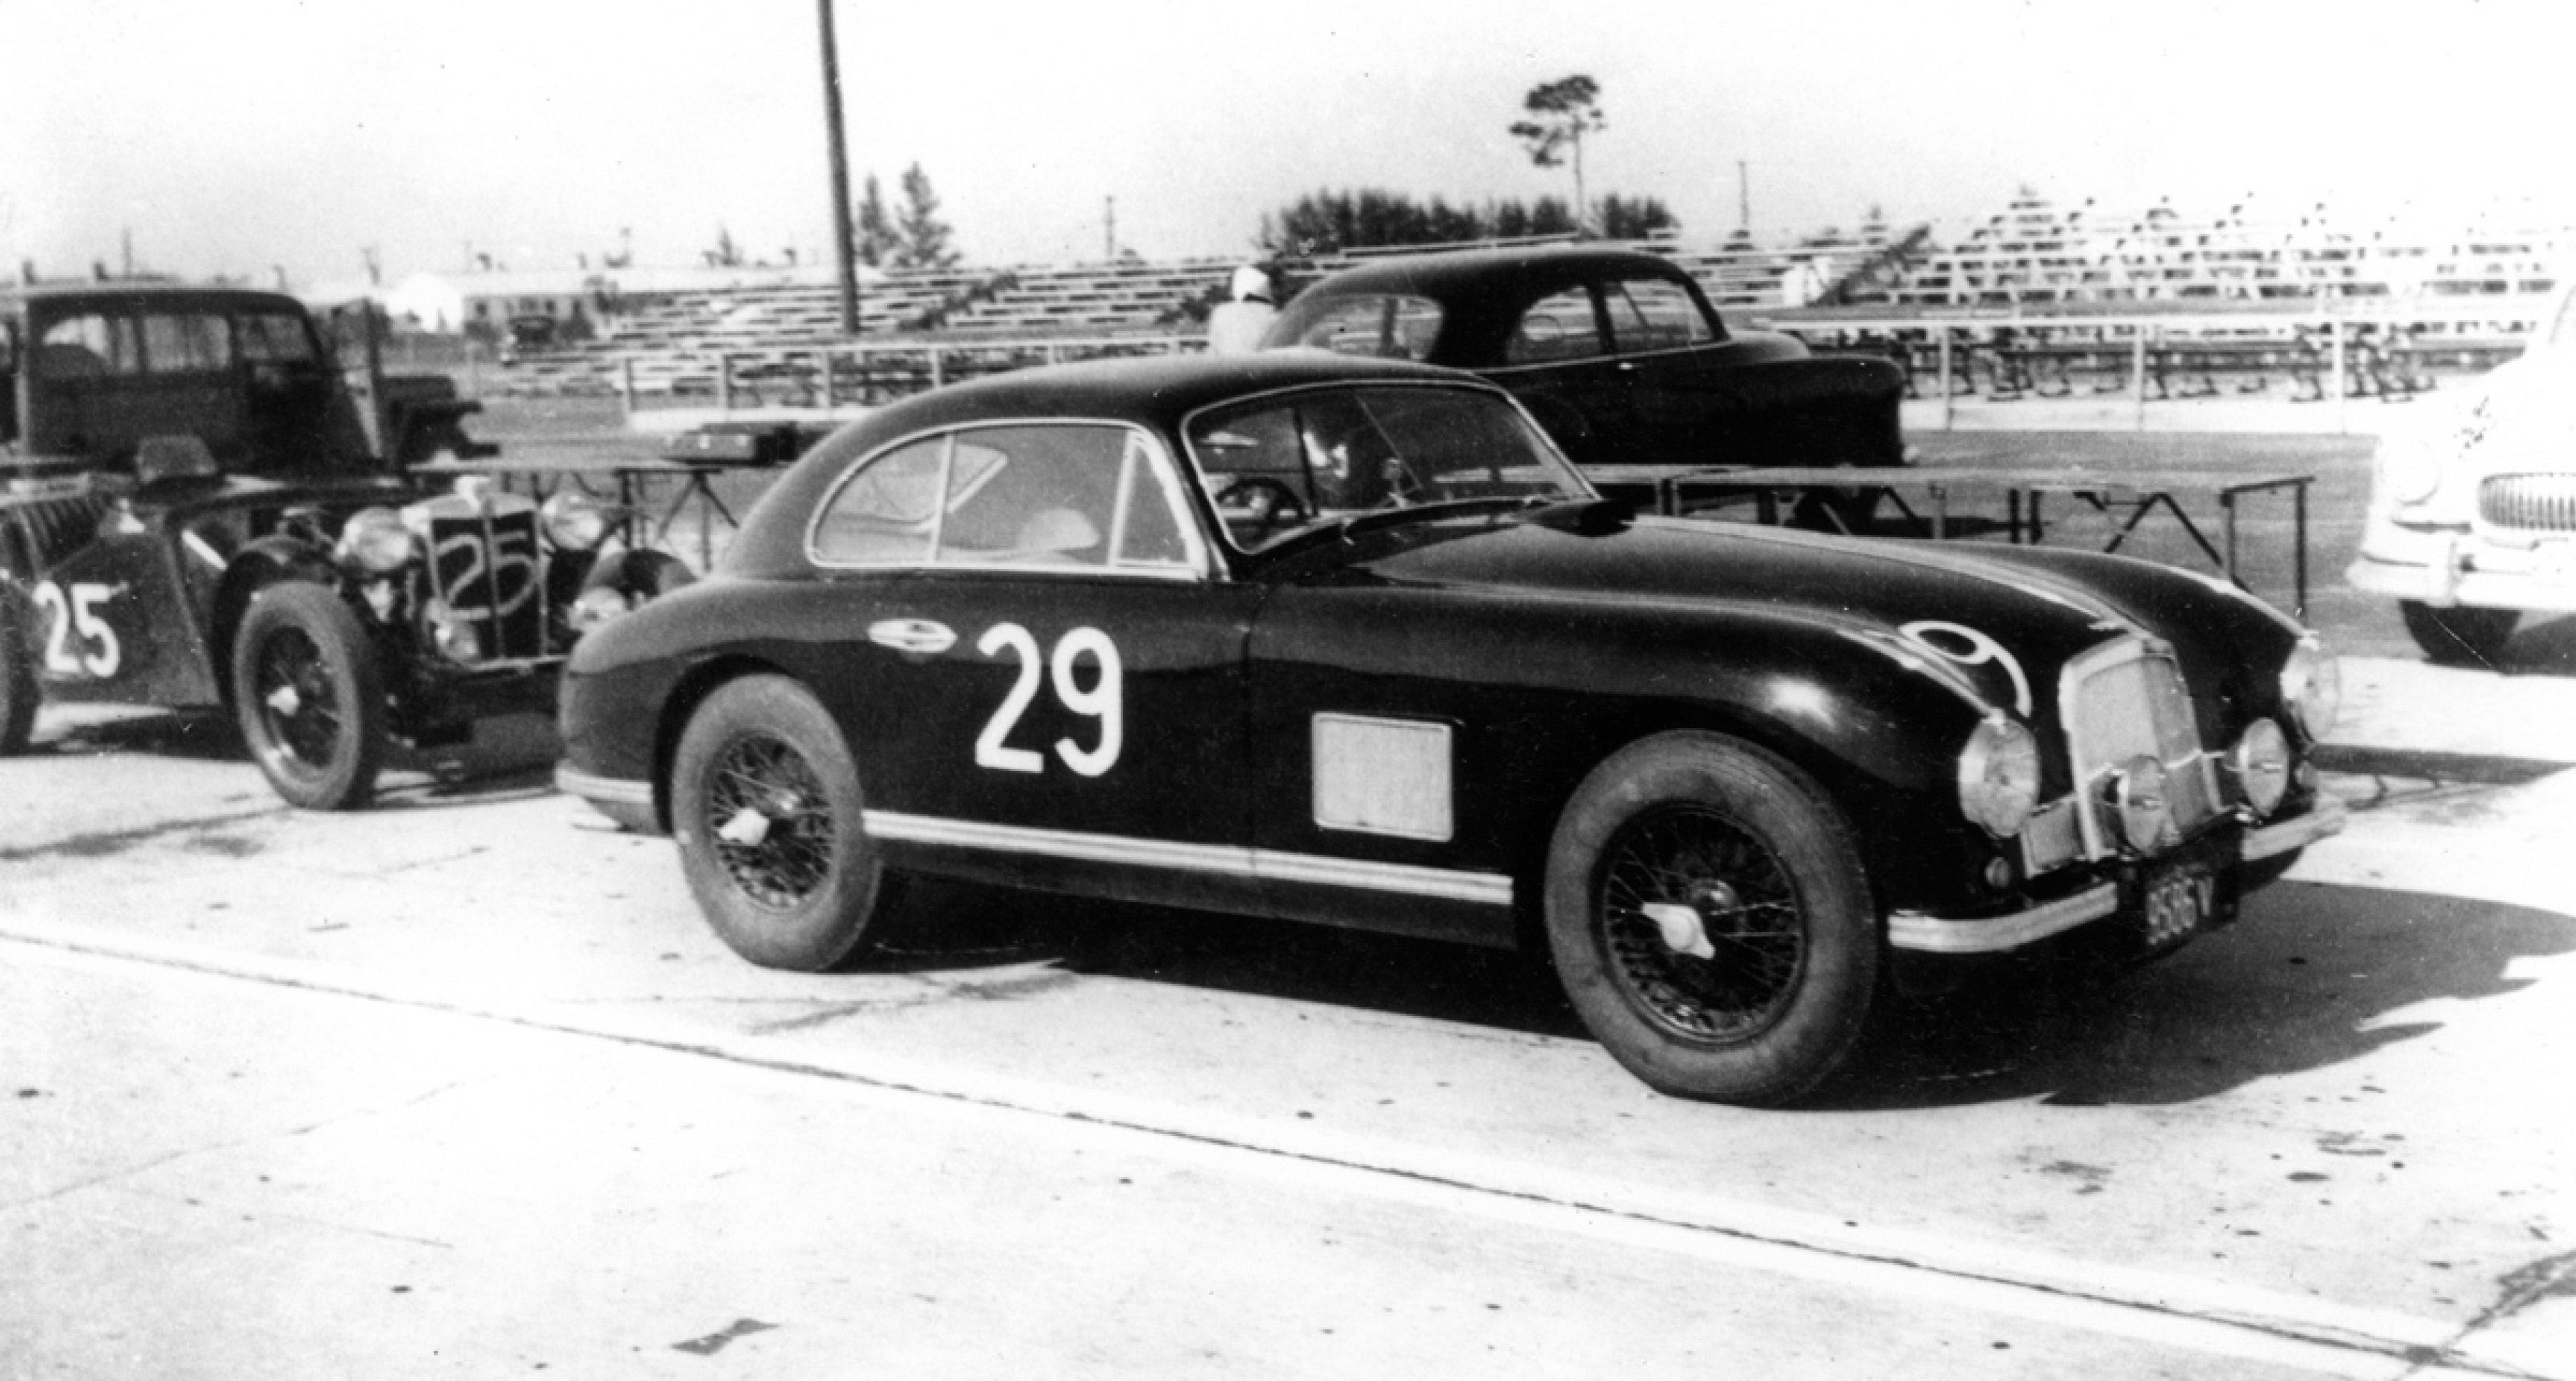 Lot 25: 1950 Aston Martin DB2 € 270.000 - 345.000